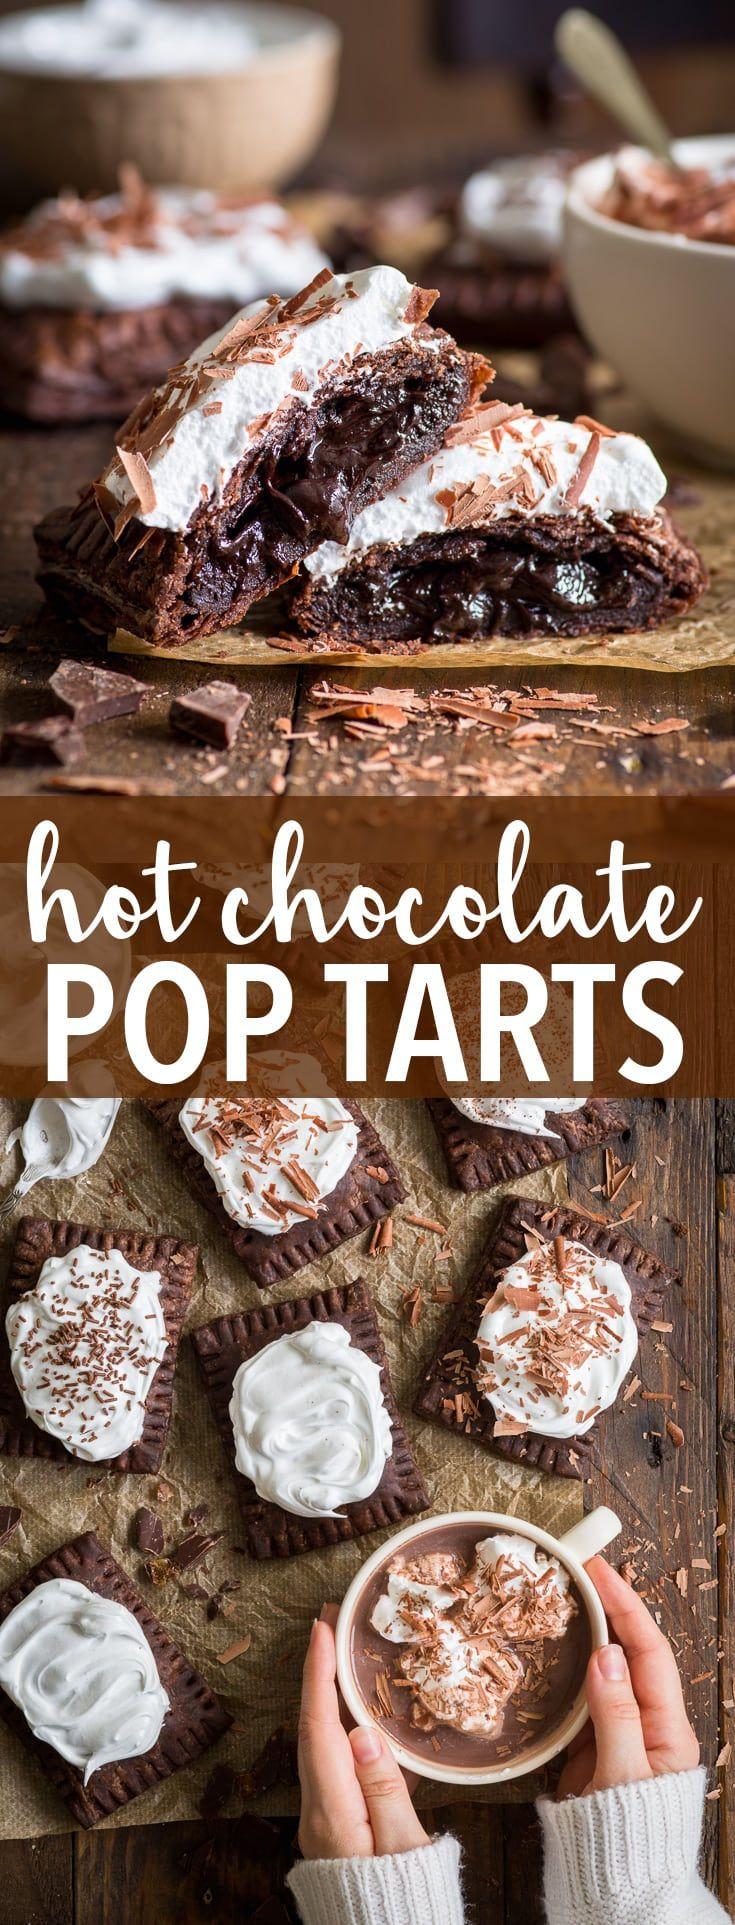 Tea and very hot tarts